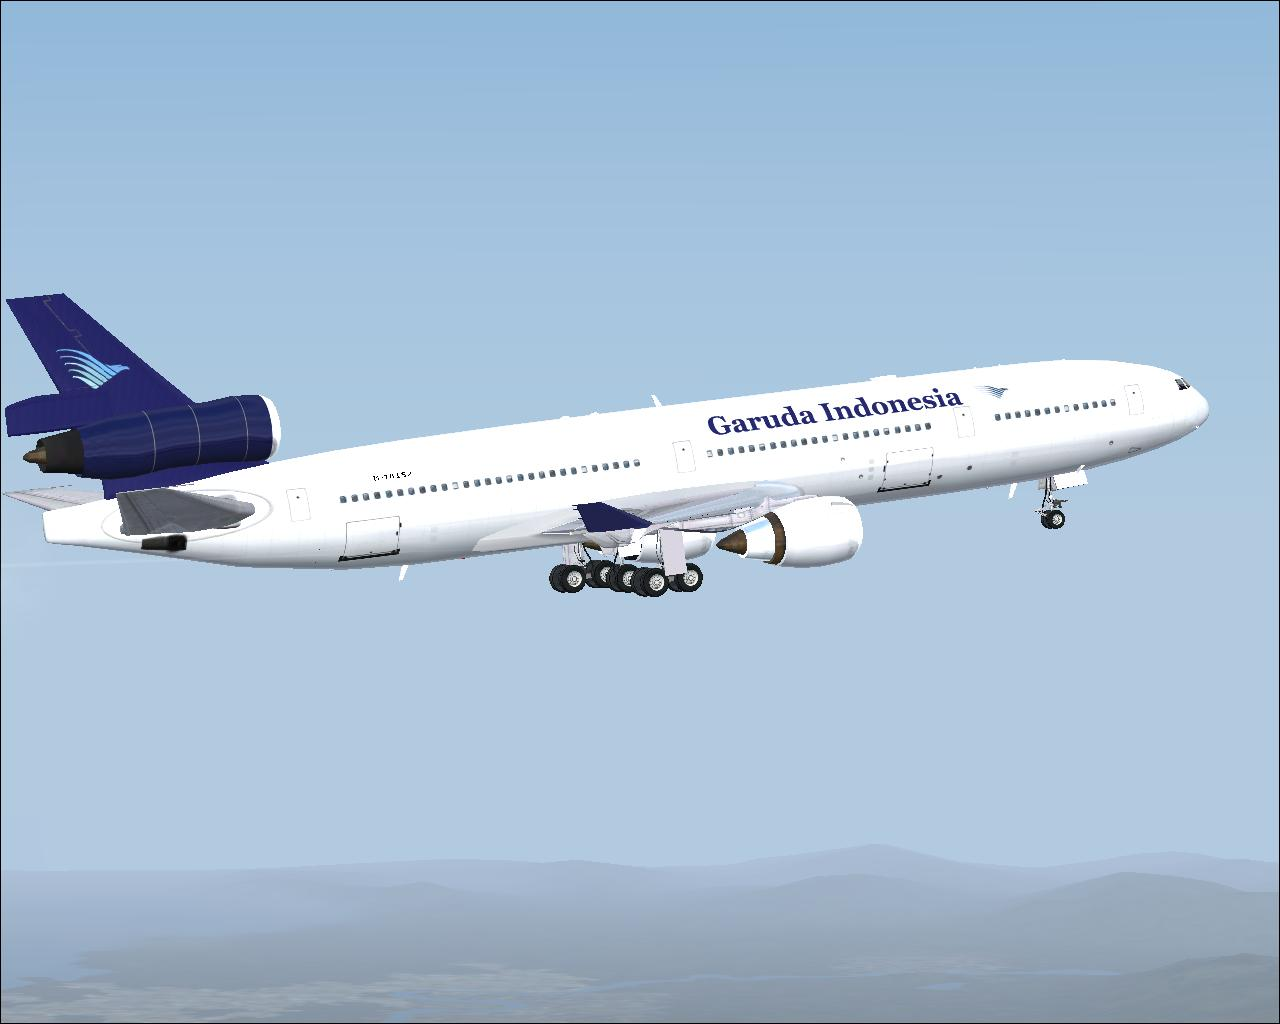 Vietnam Airlines news on Garuda Airlines fleet expansion